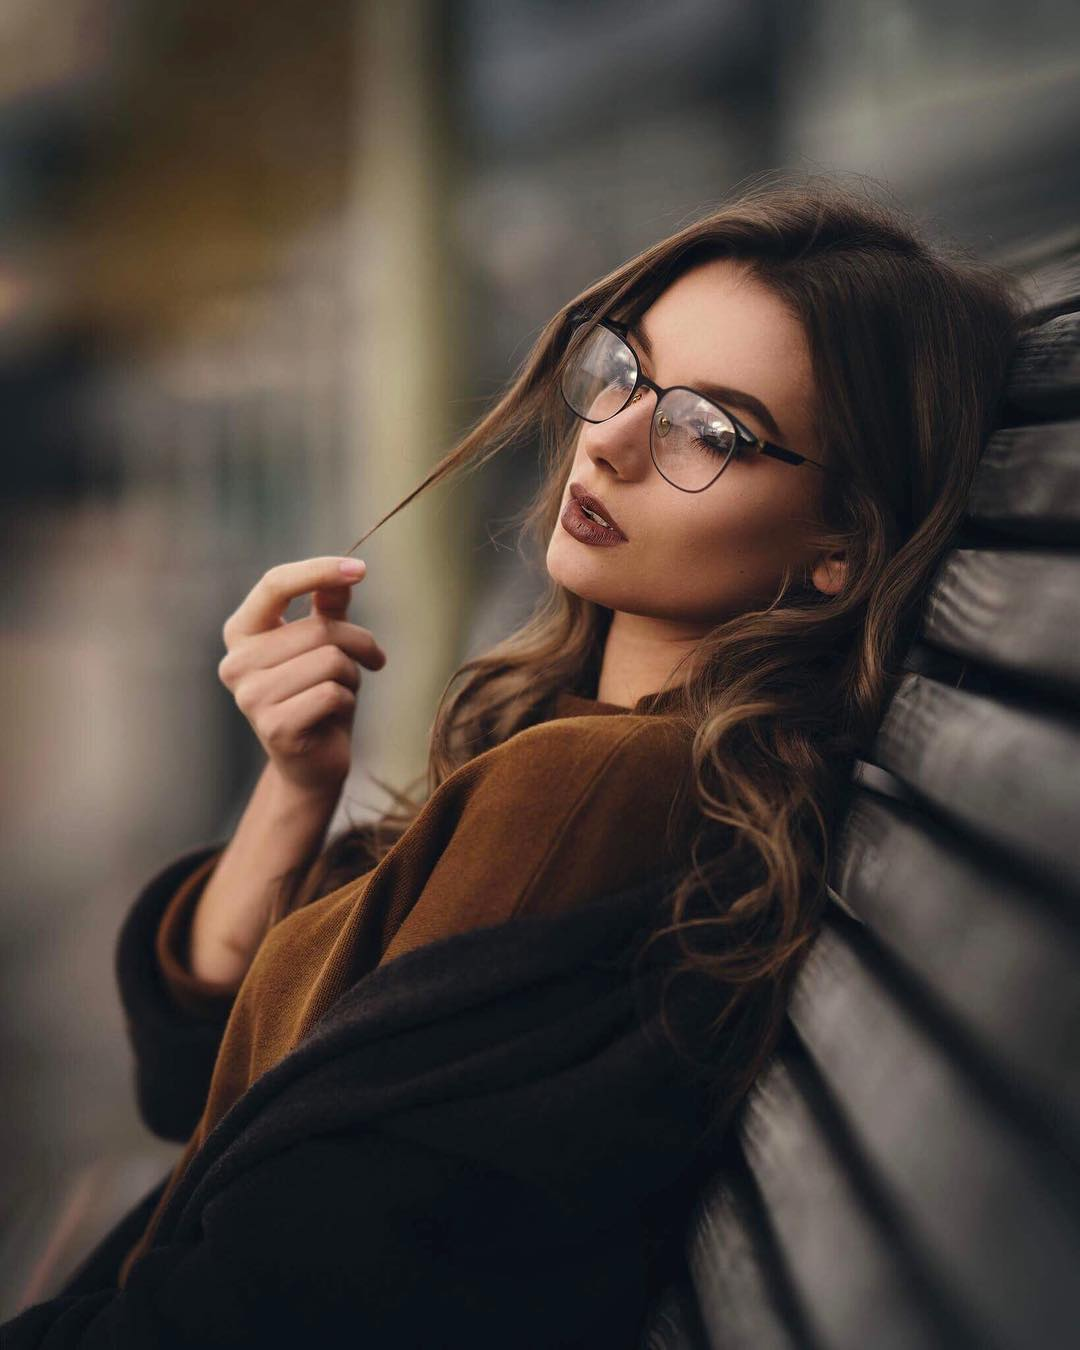 Marvelous Female Portrait Photography By Kai Böttcher